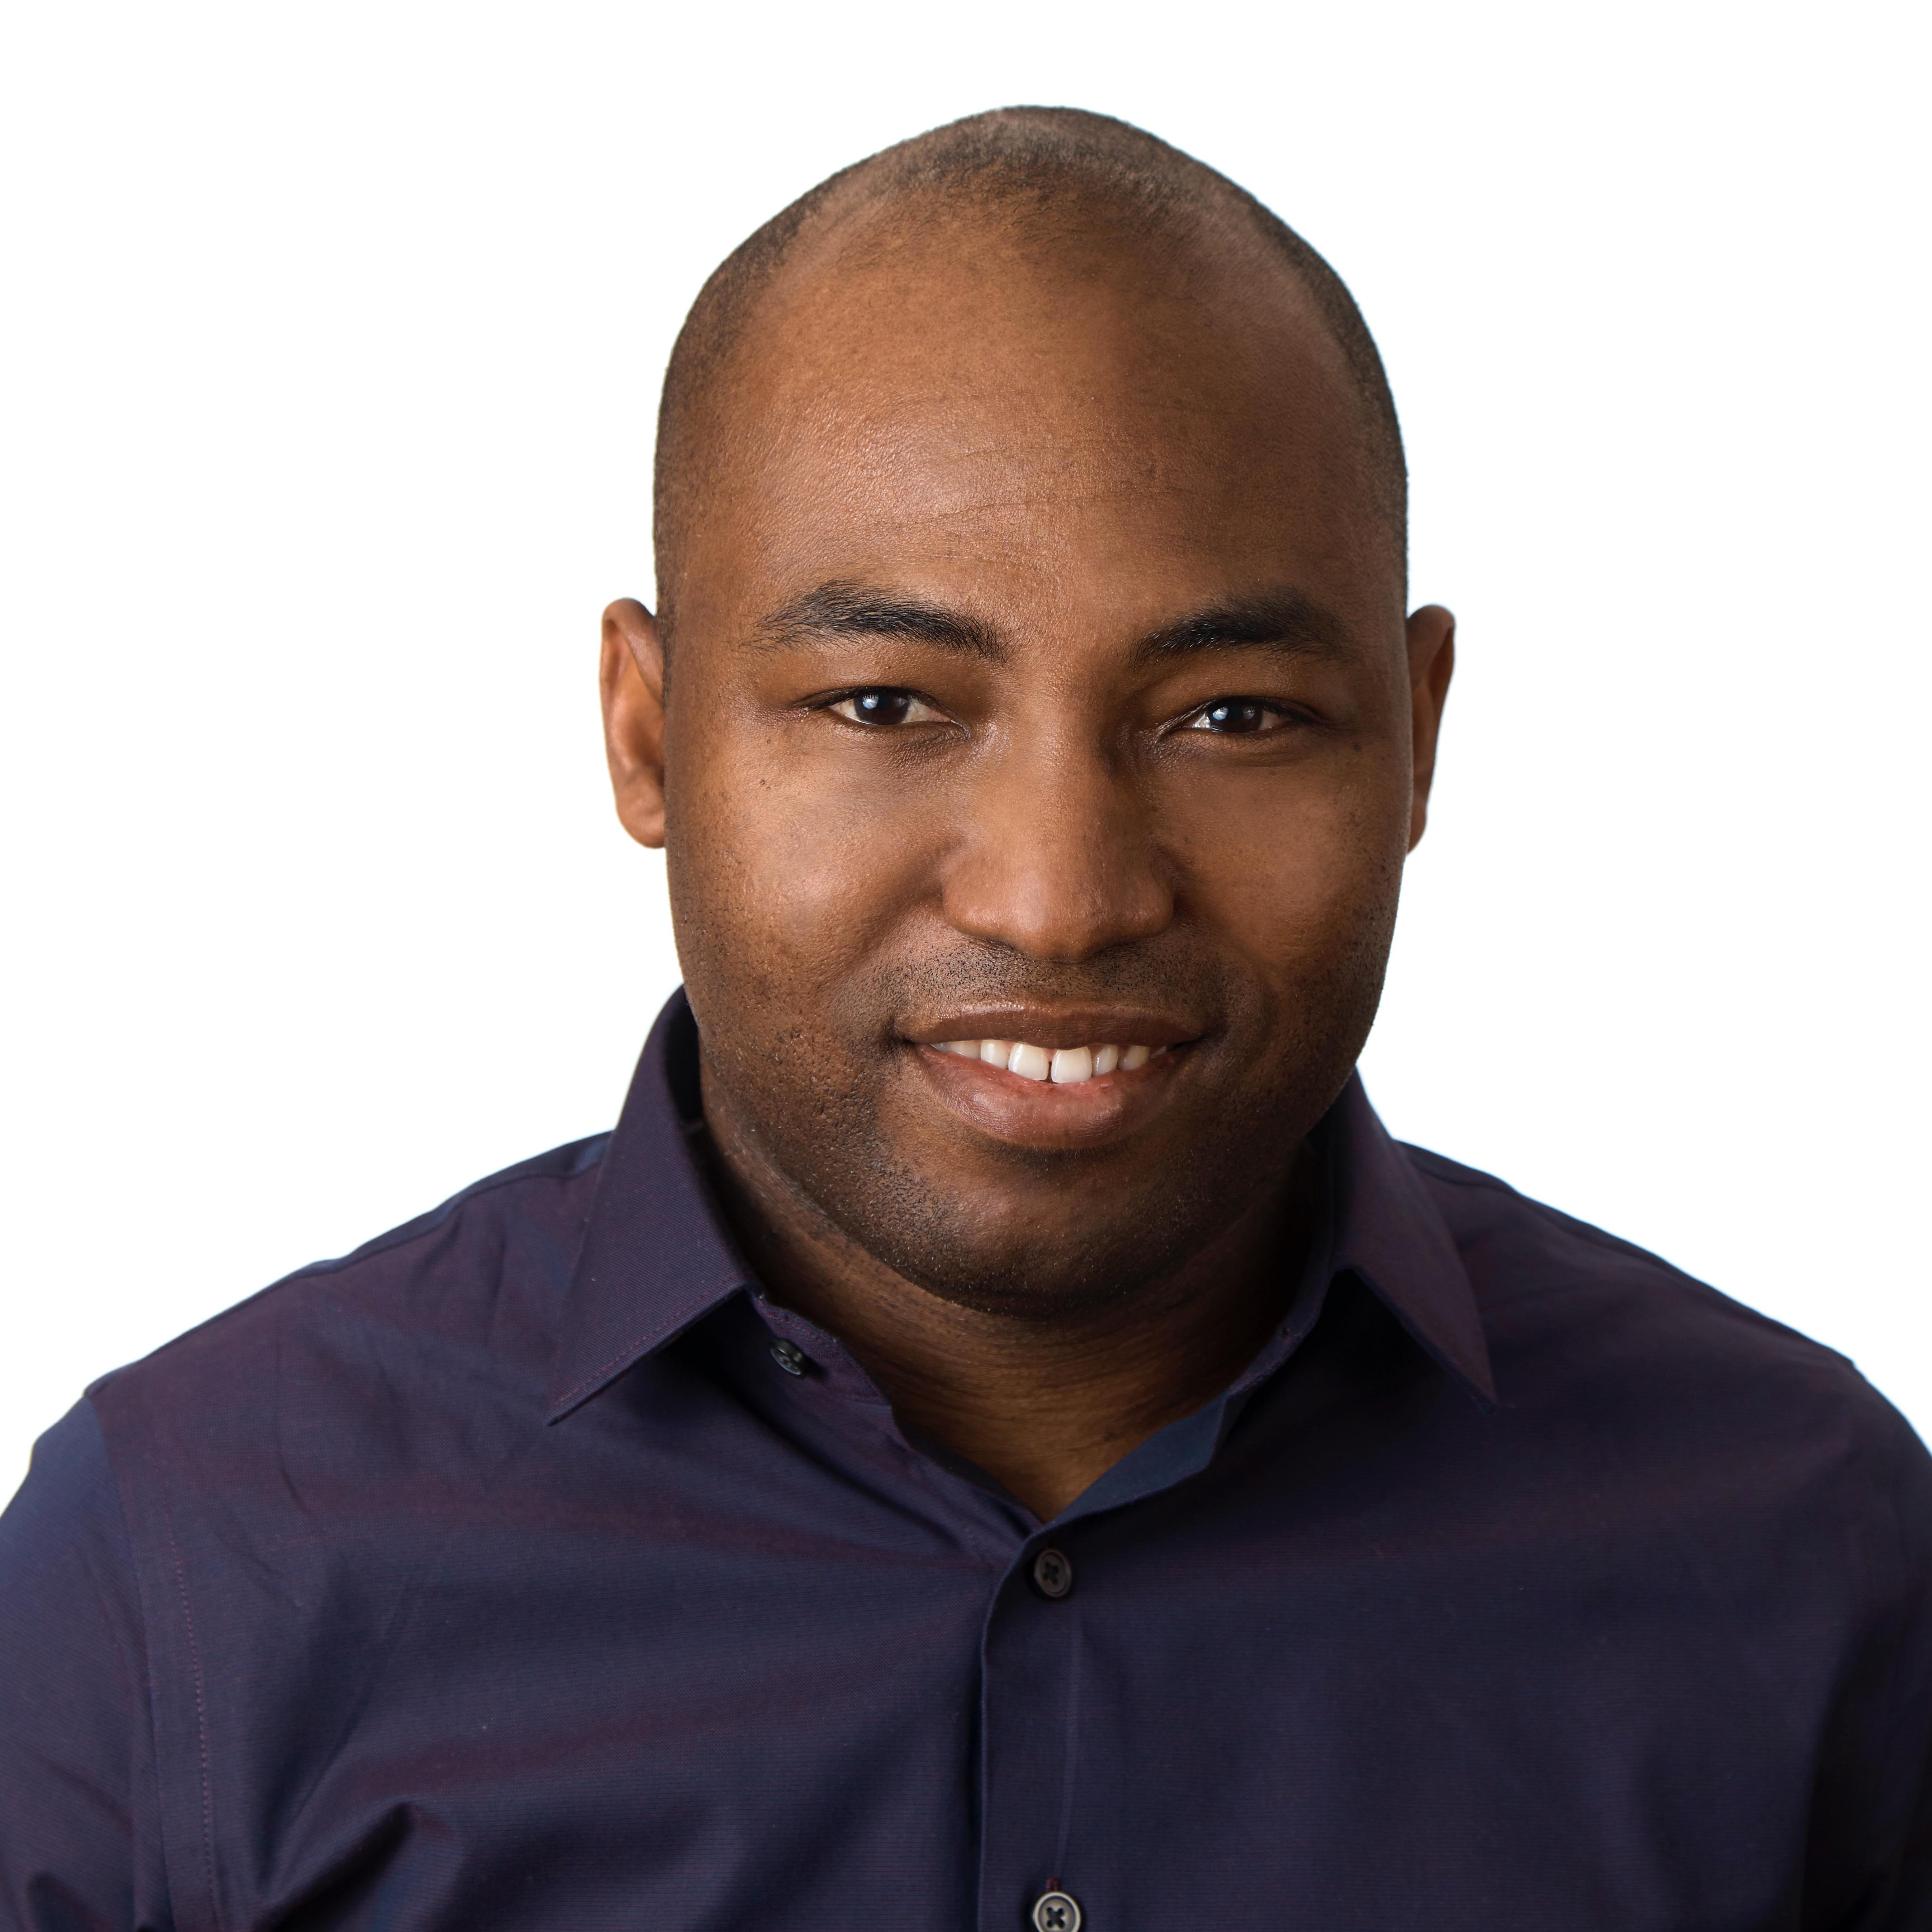 Dr. Oluwakayode A Olowoyo